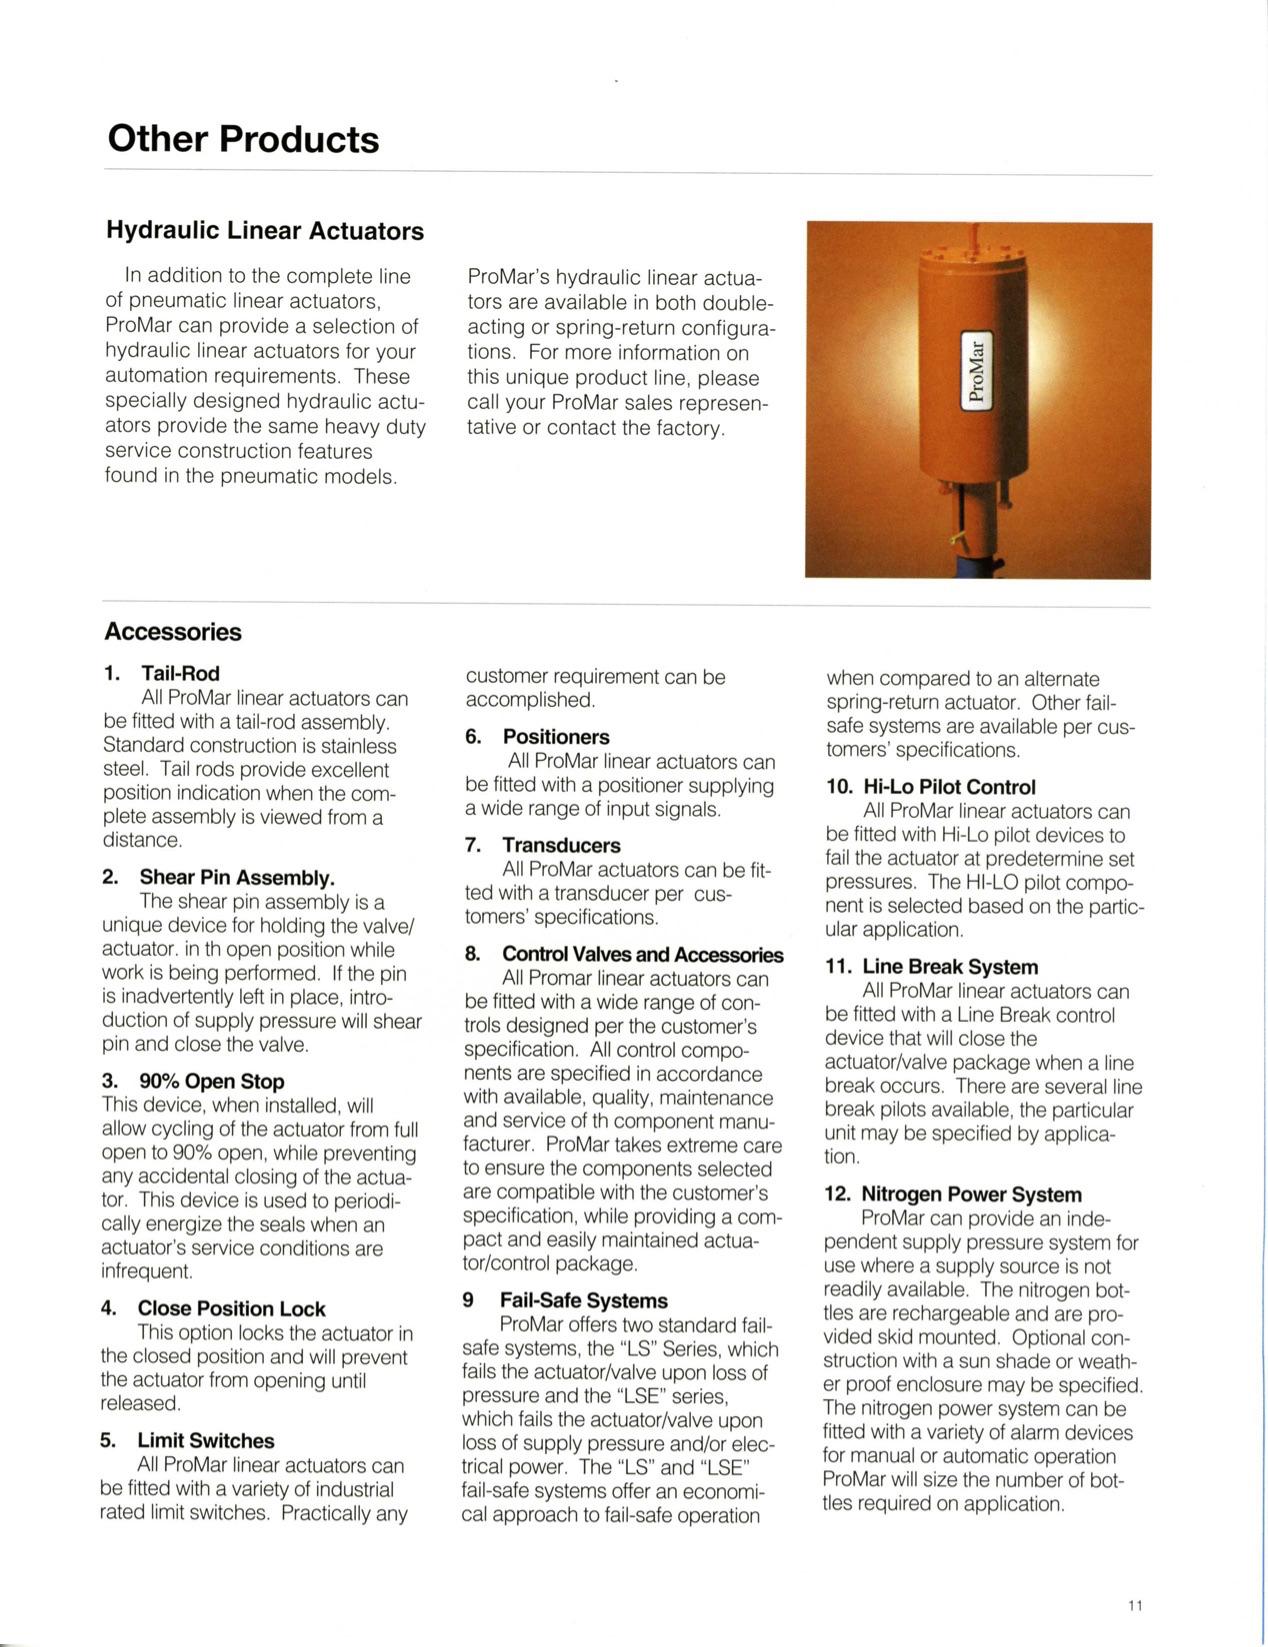 PMI-CatalogColor11.jpeg